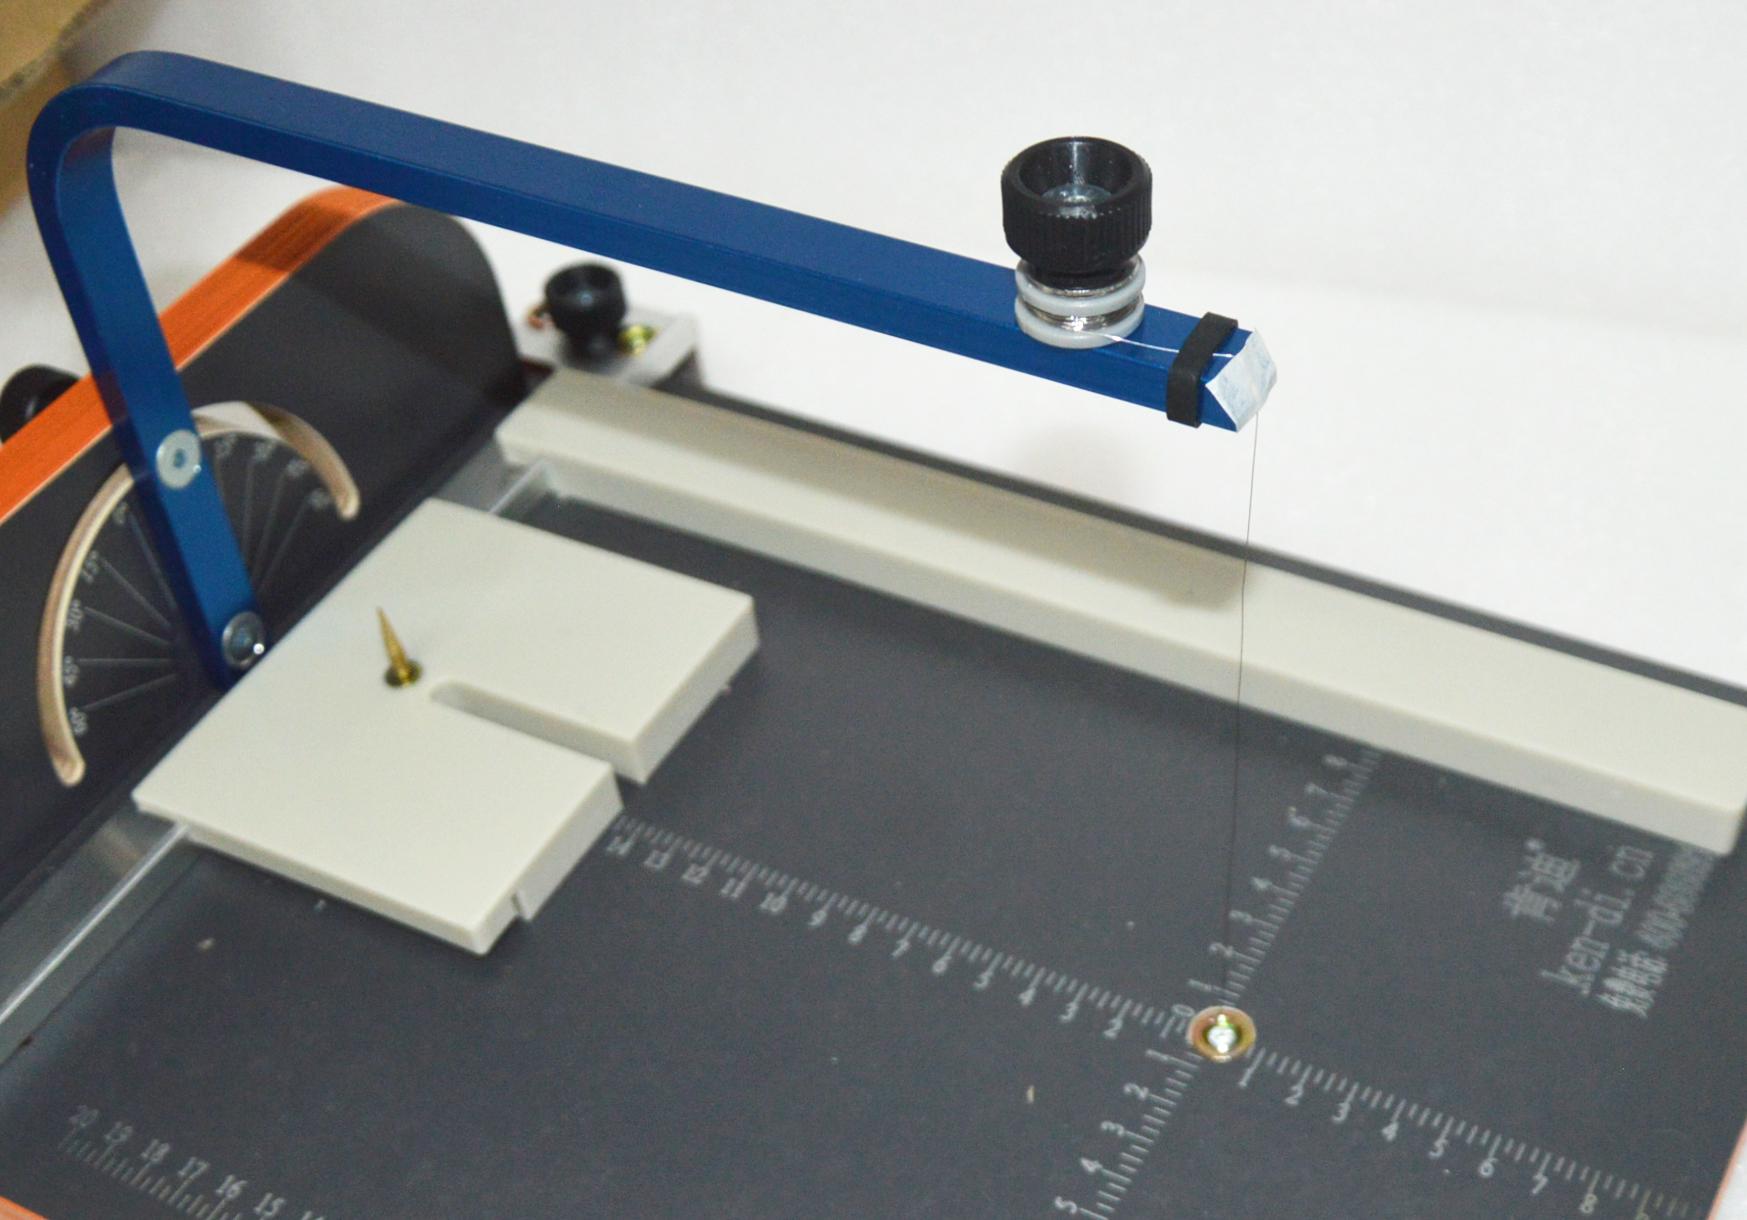 Hot Wire EPS cutting sponge Pearl cotton Cutter table - Buy sponge ...